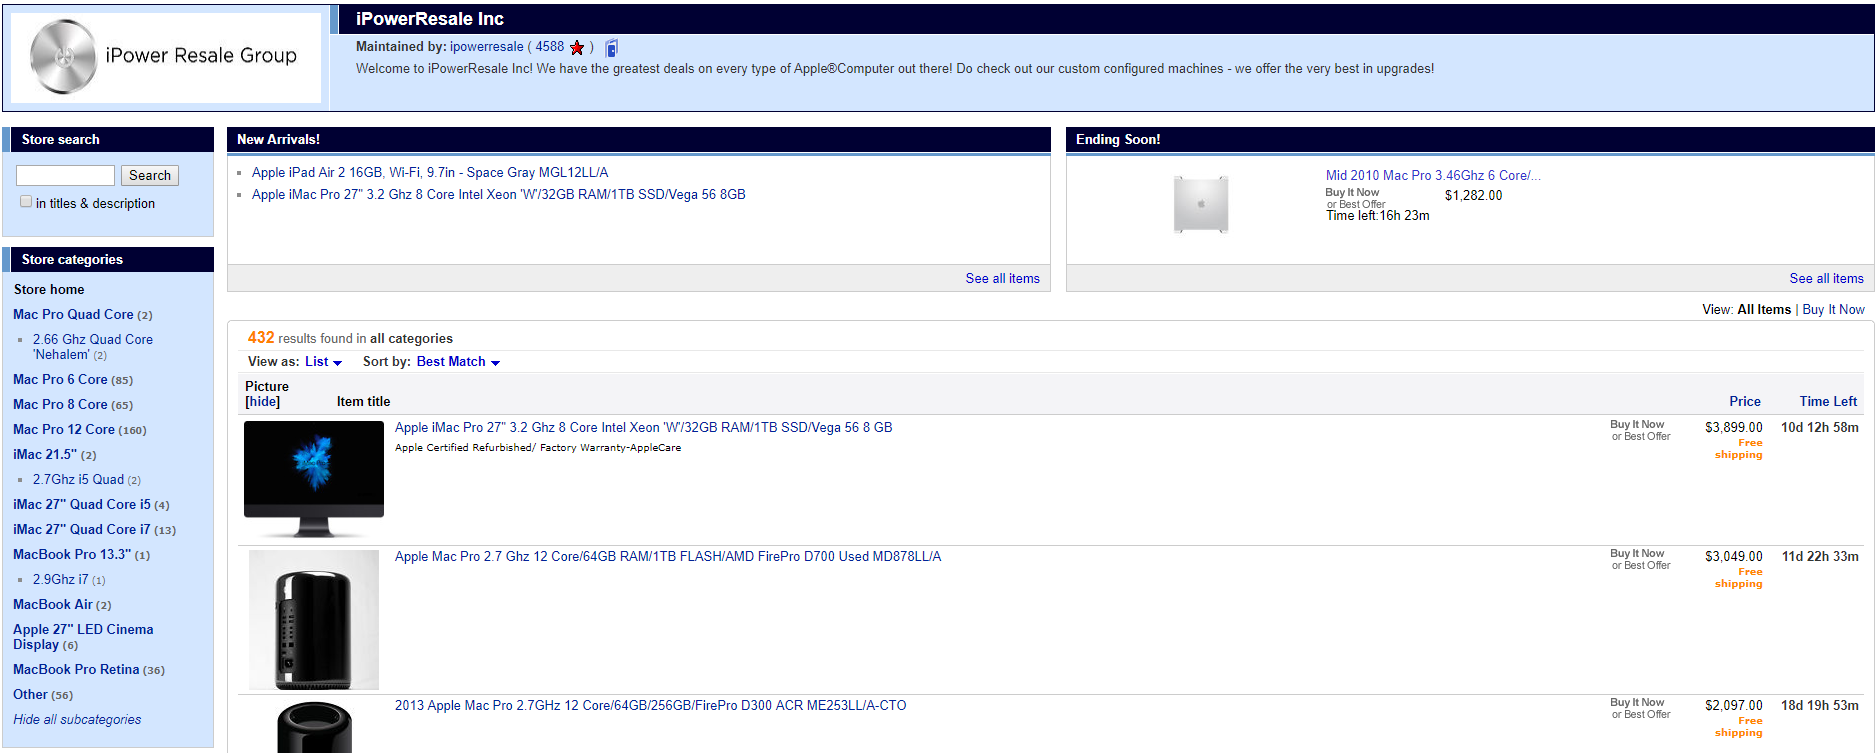 a107cd2eca8c1 inkFrog Streamlines Listings and Updates for iPowerResale